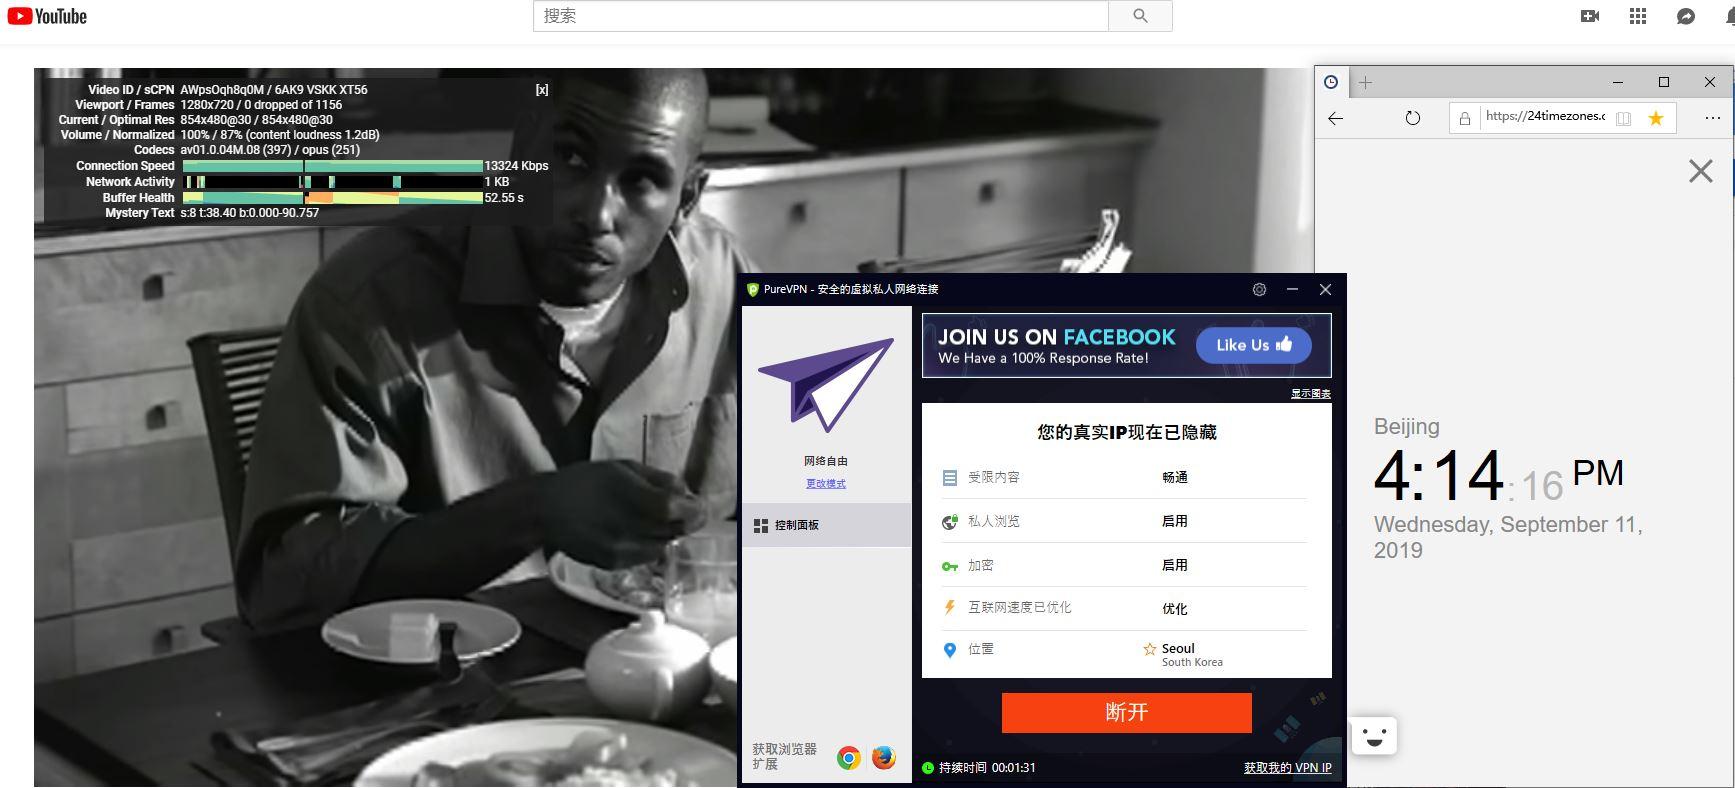 windows pureVPN 韩国服务器 中国VPN翻墙 科学上网 YouTube速度测试-2-20190911